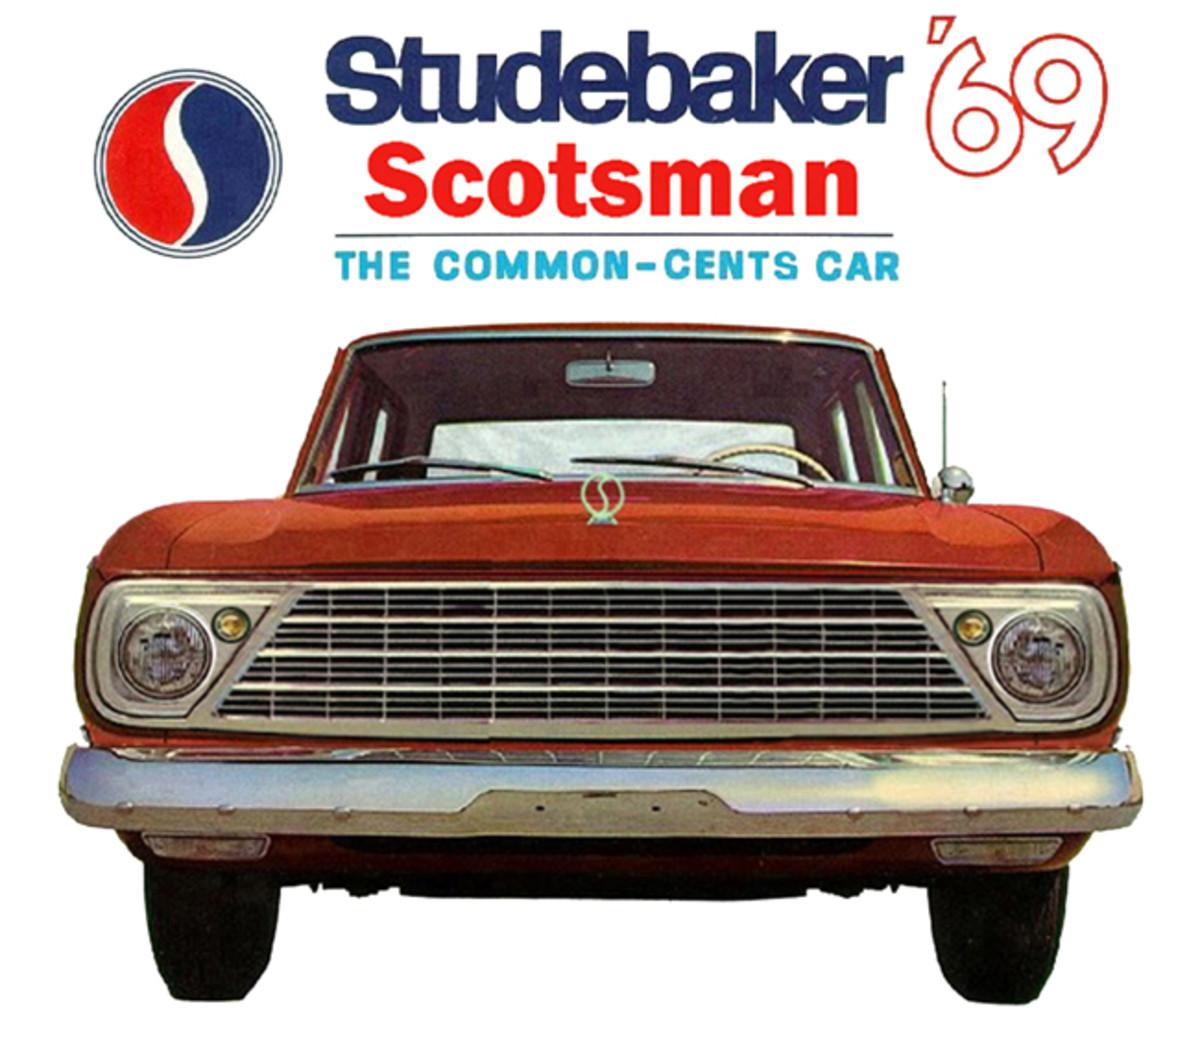 1969 Studebaker Scotsman_MJF